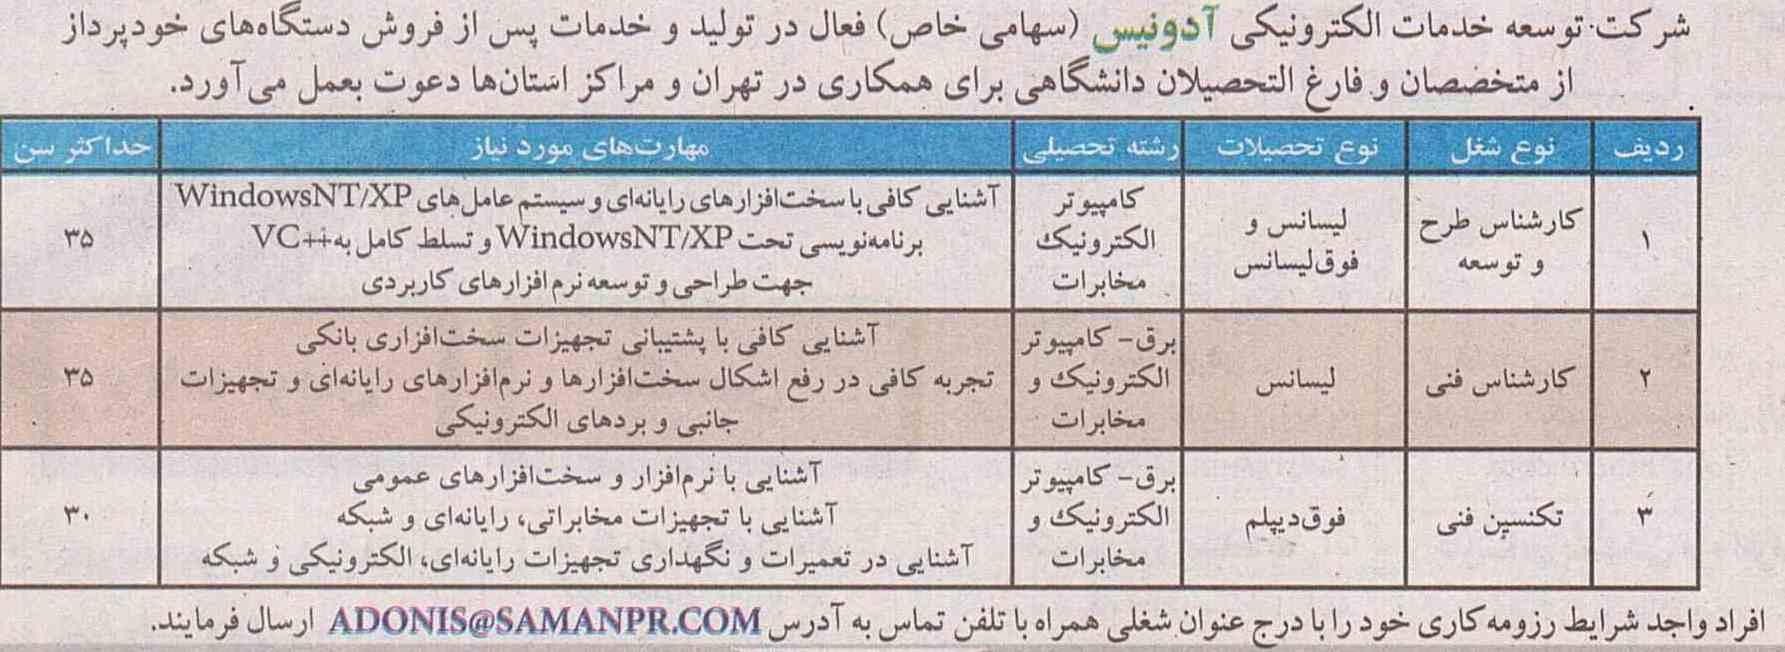 adonis استخدام شرکت توسعه خدمات الکترونیکی آدونیس در سراسر ایران